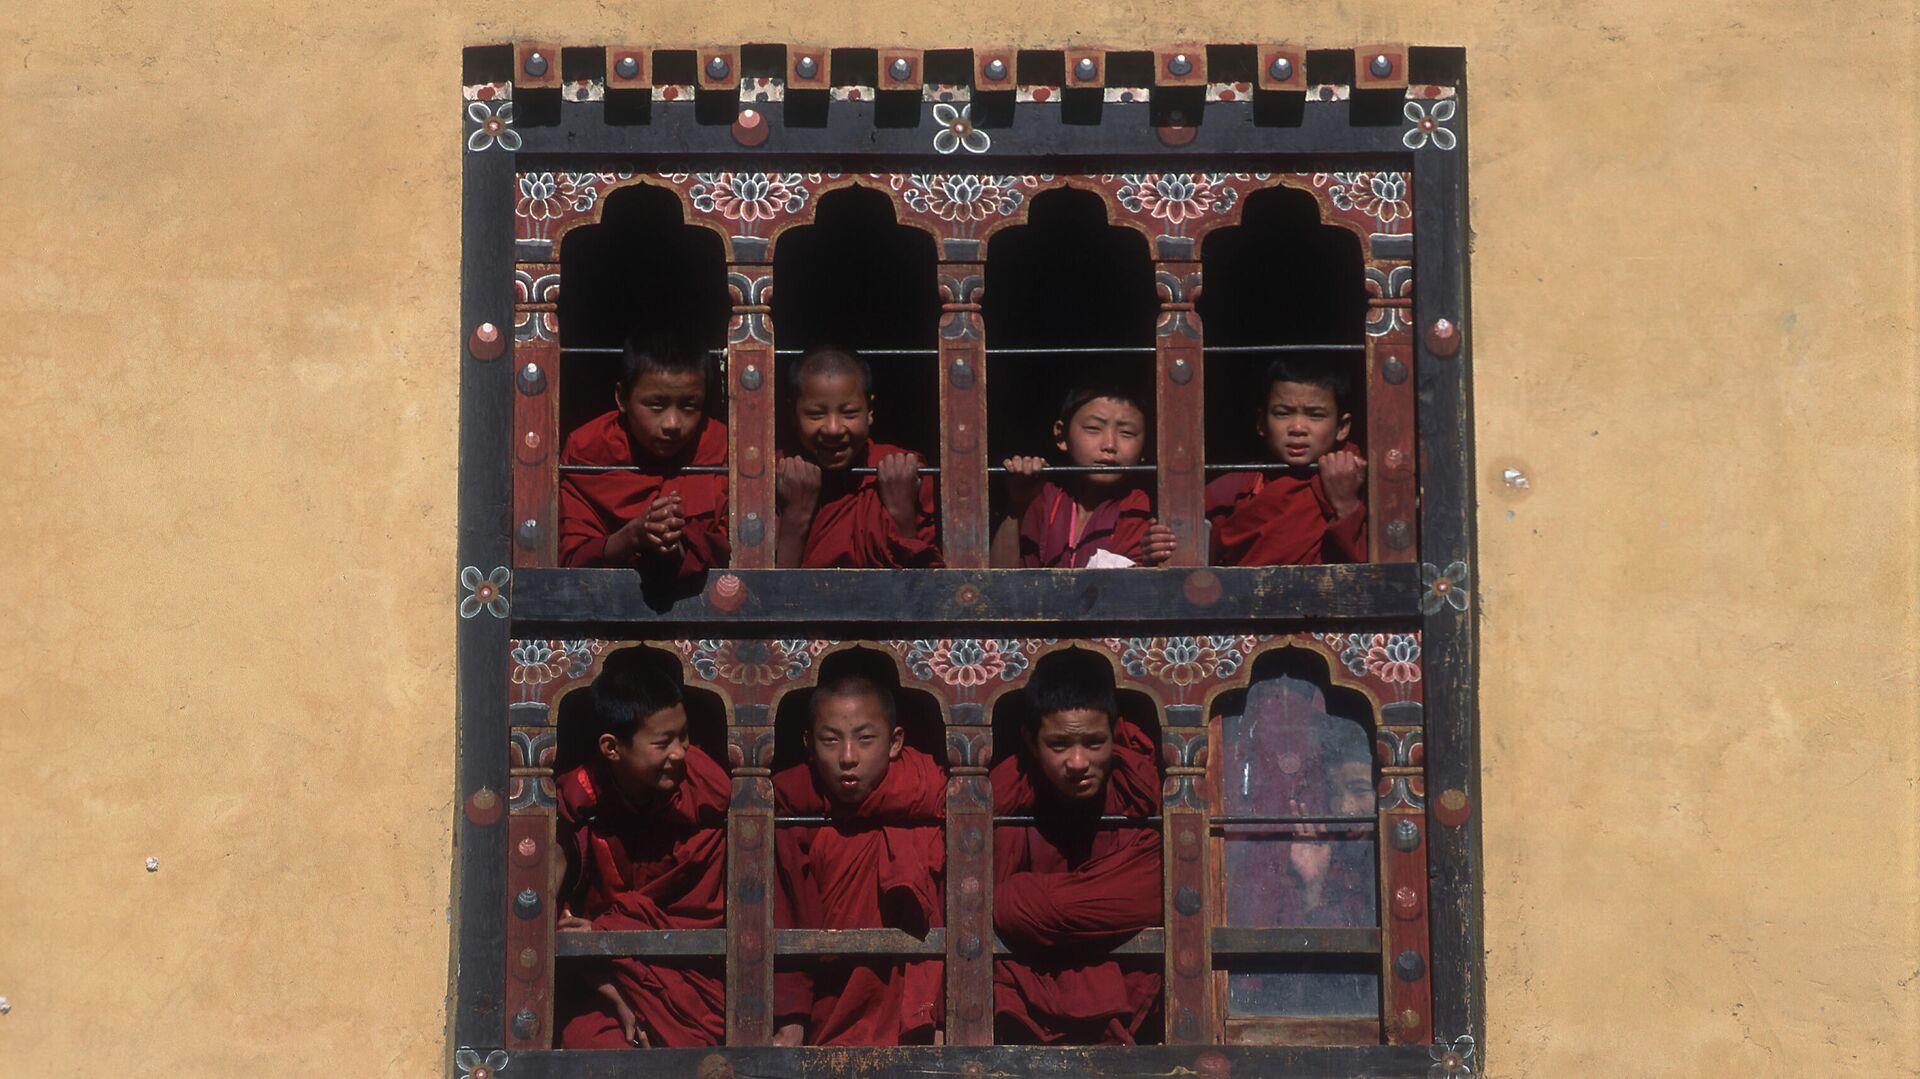 Monastero buddhista in Bhutan - Sputnik Italia, 1920, 17.07.2021